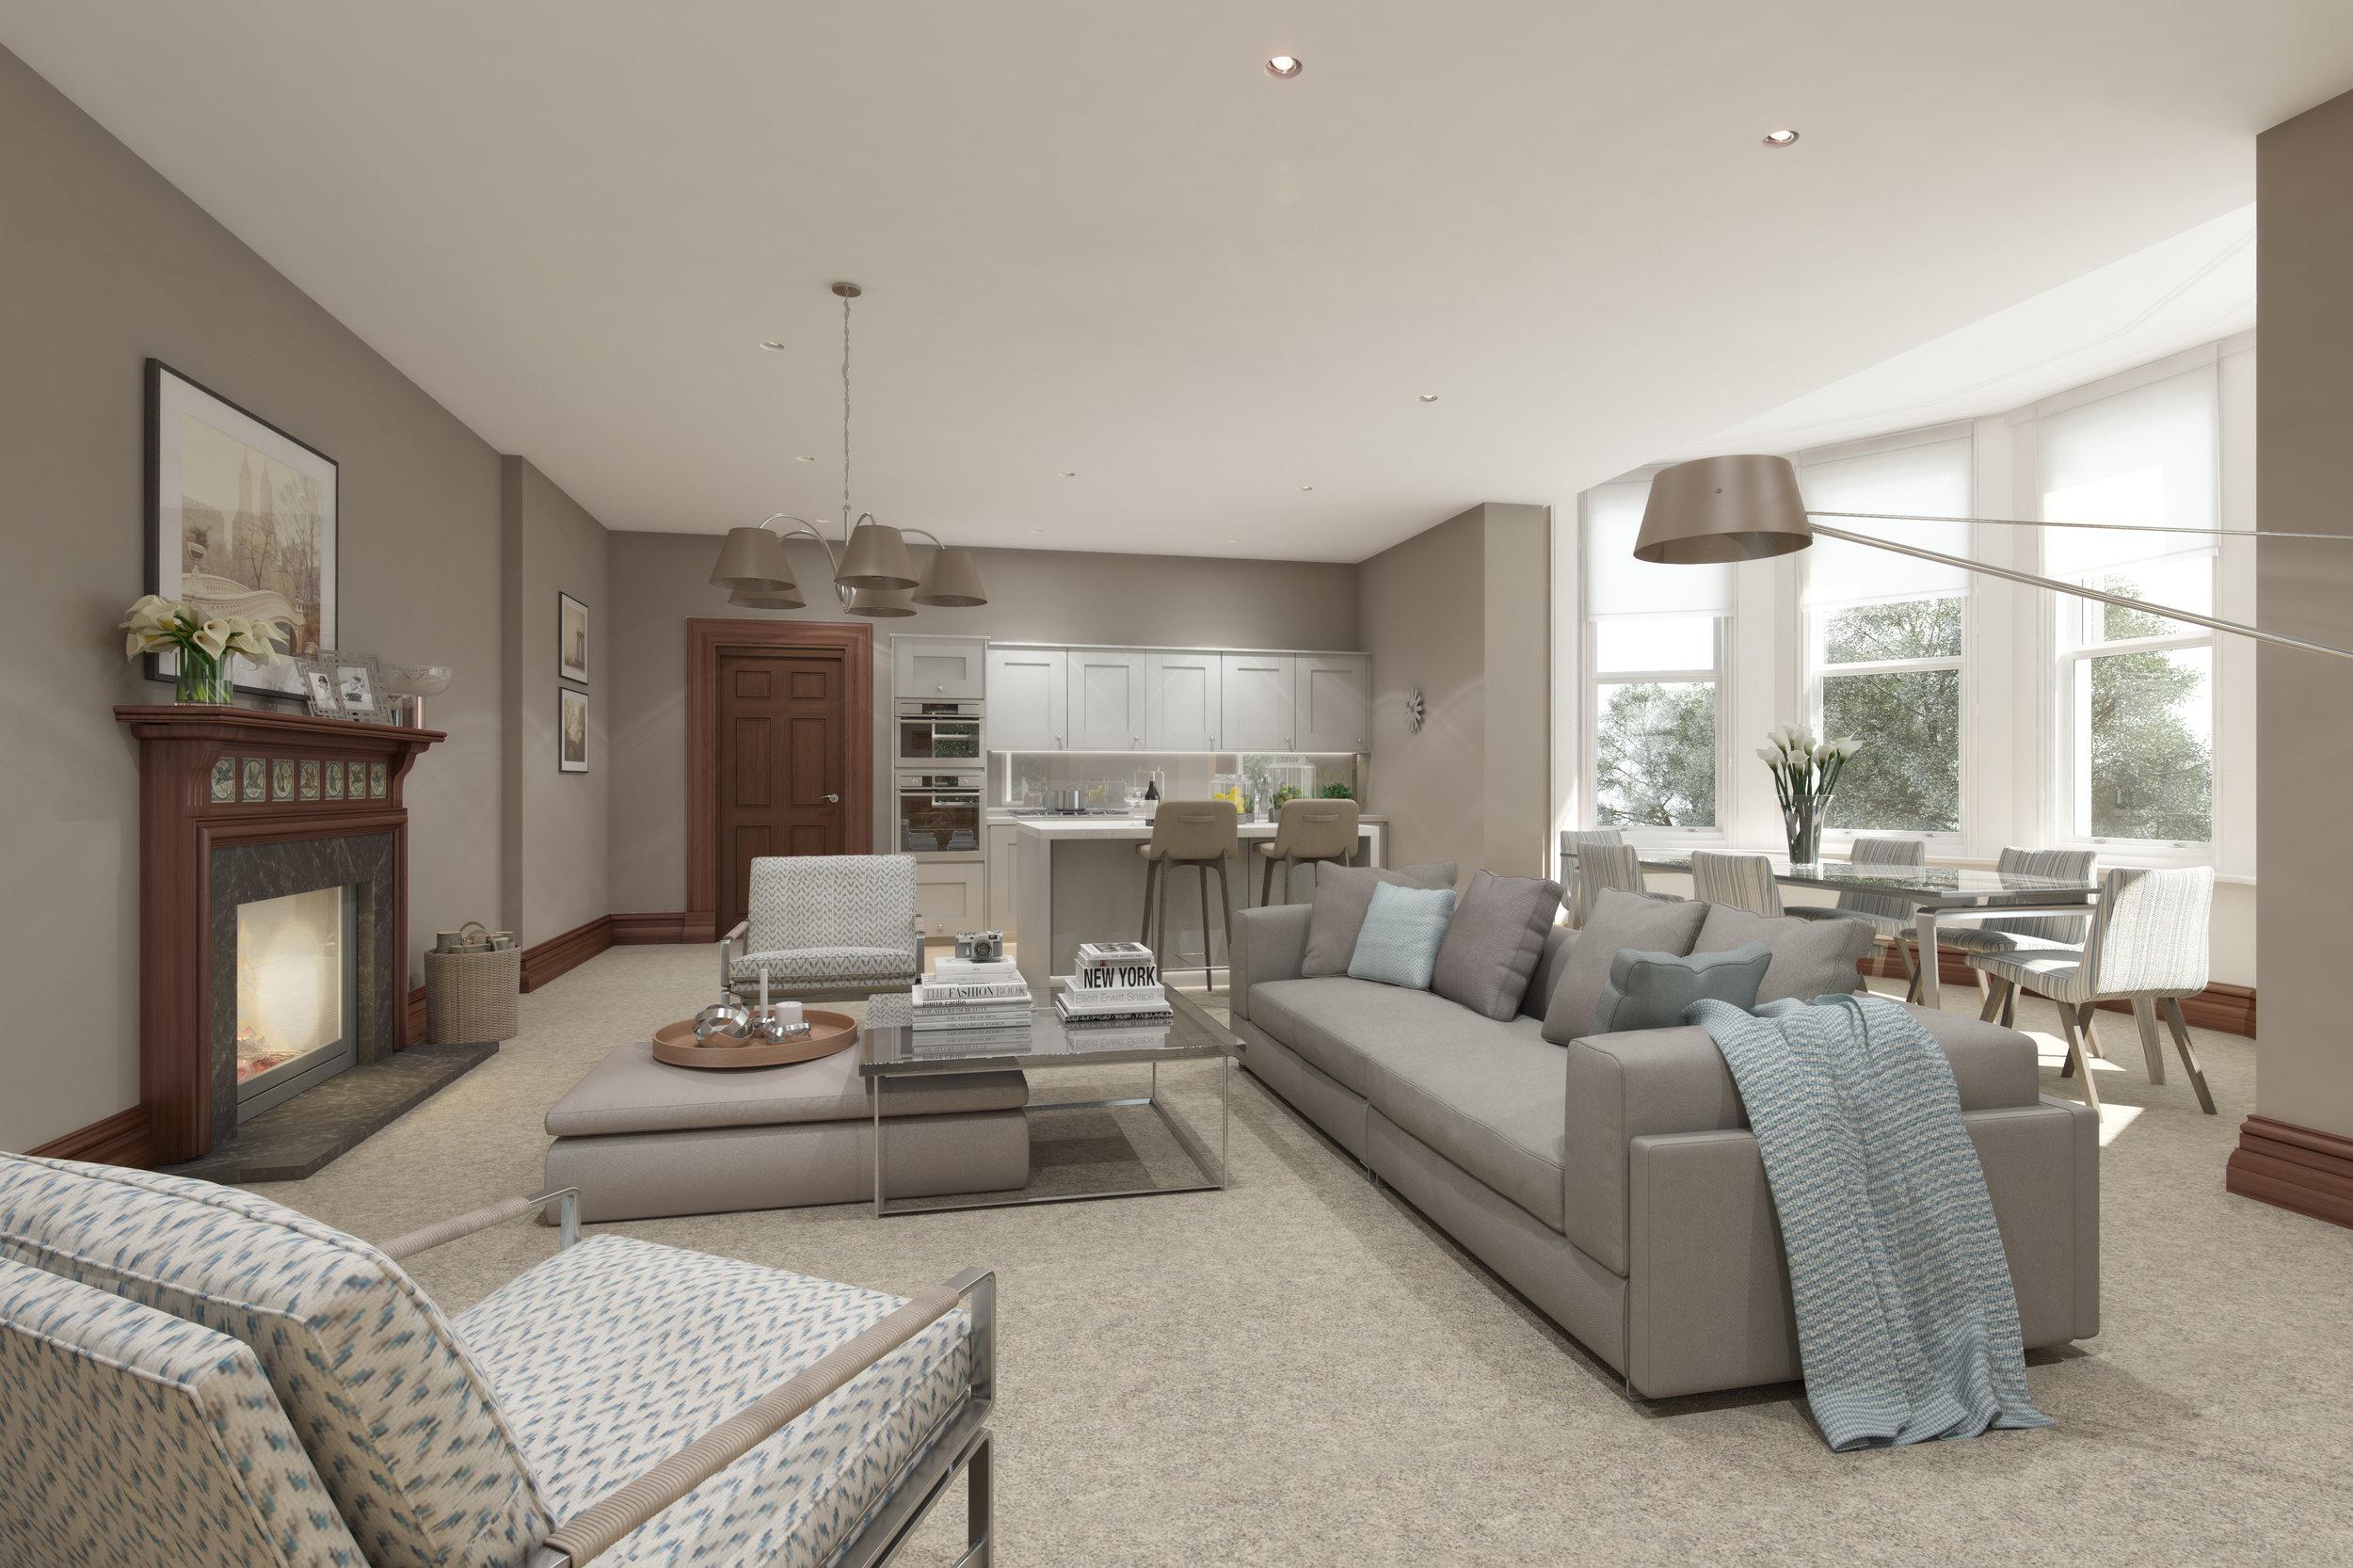 Spenfield_House_Interior_Apartment_01.jpg